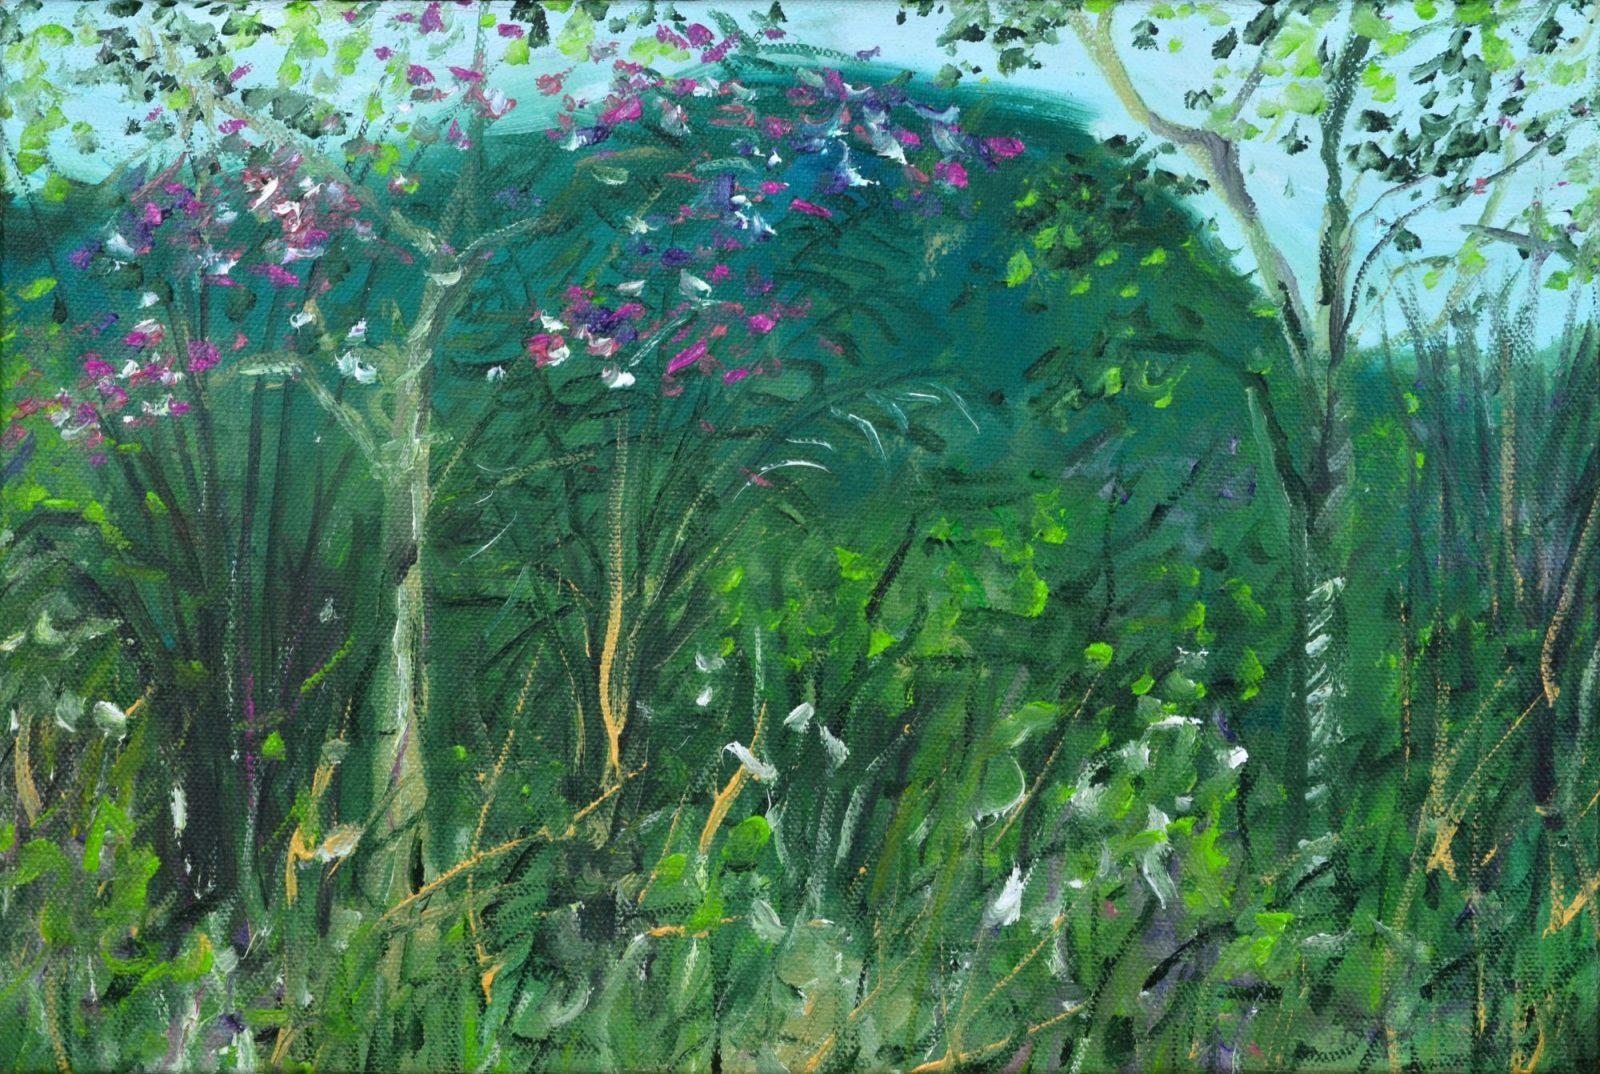 franyo aatoth: Garden Series 14.